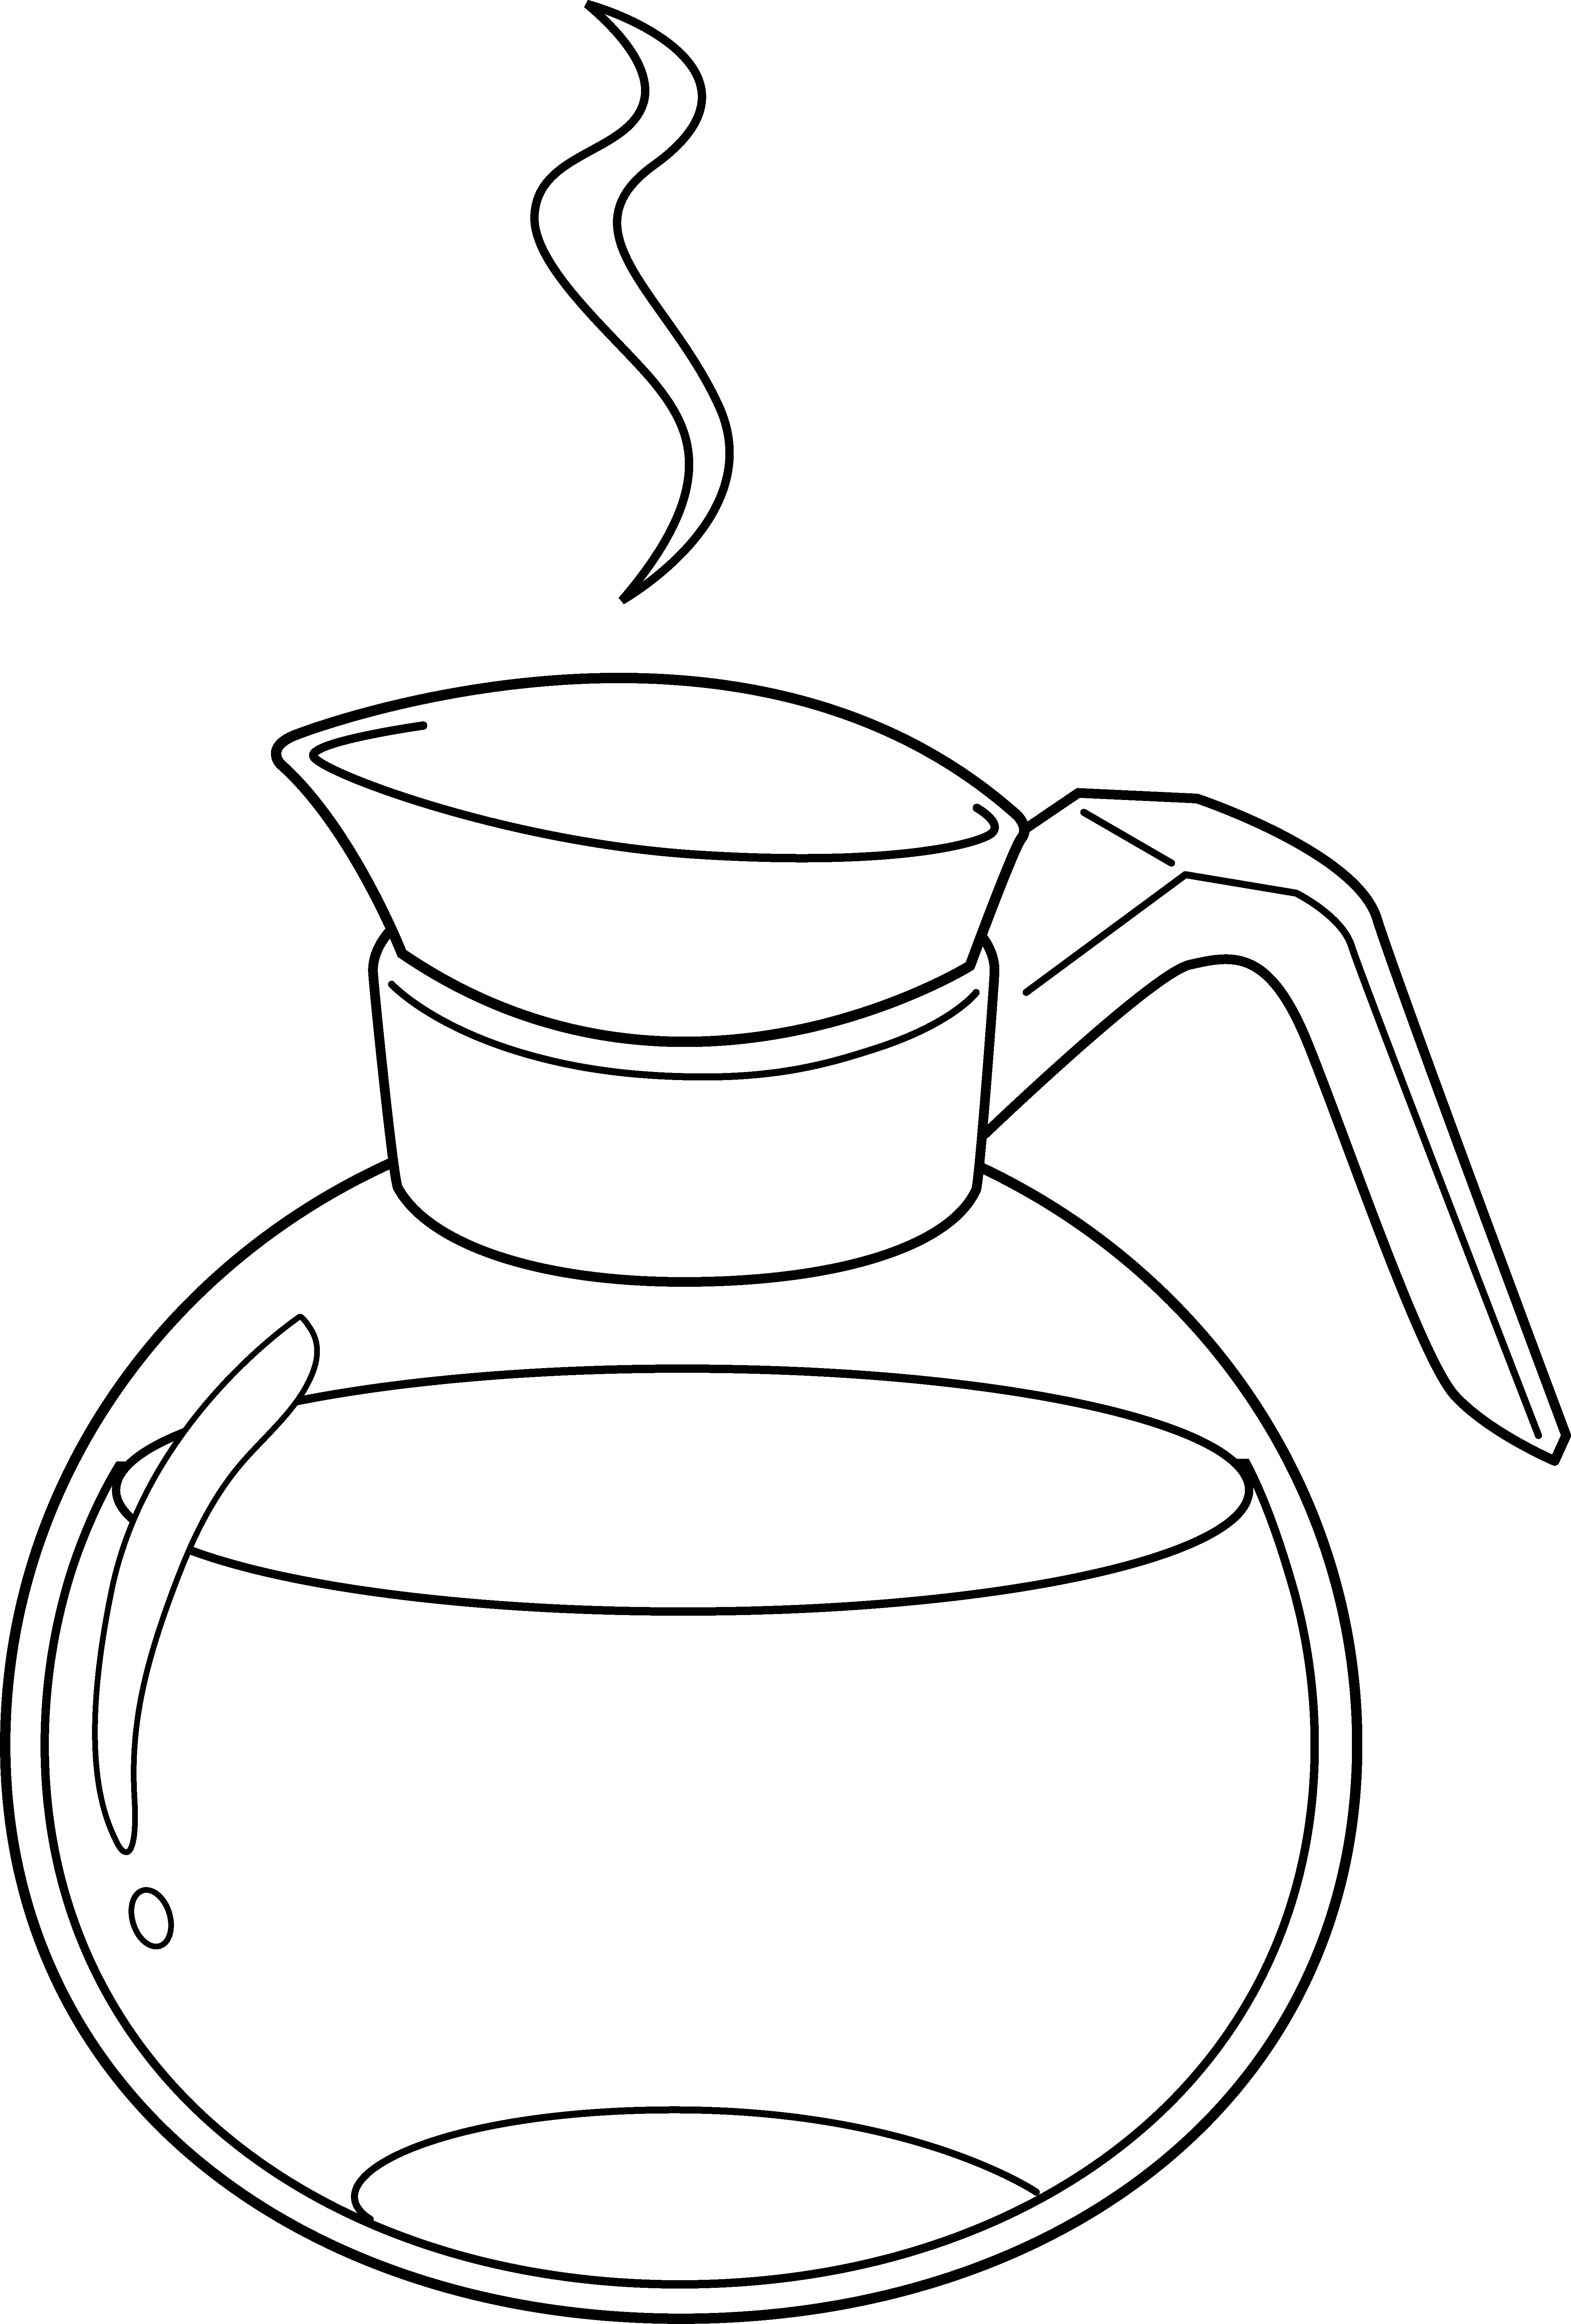 Coffee Pot Line Art - Free .-Coffee Pot Line Art - Free .-13